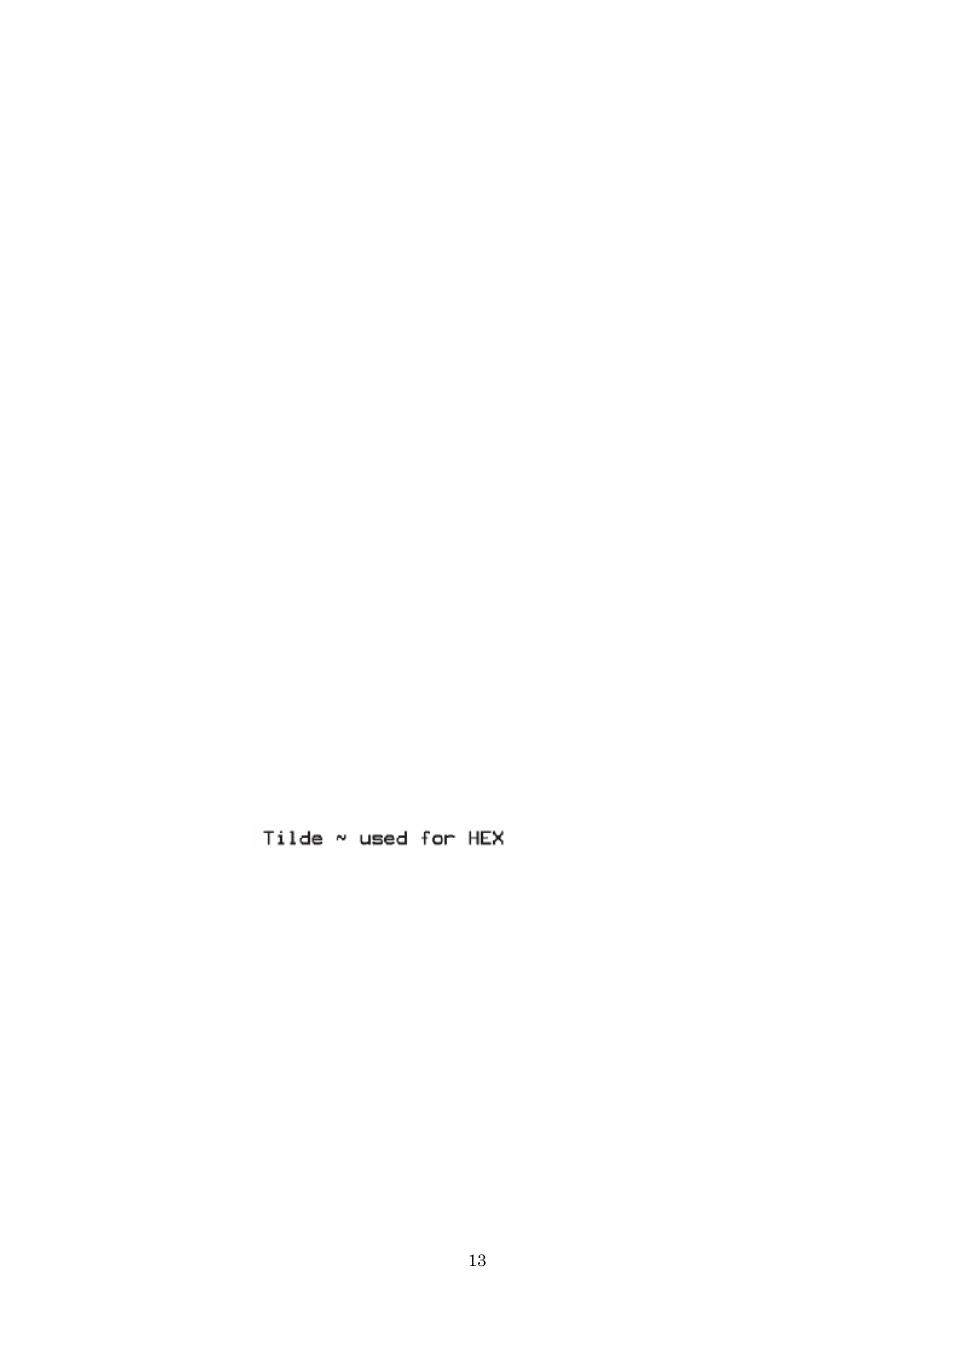 Printer configuration, Field hexadecimal indicator, Print mode